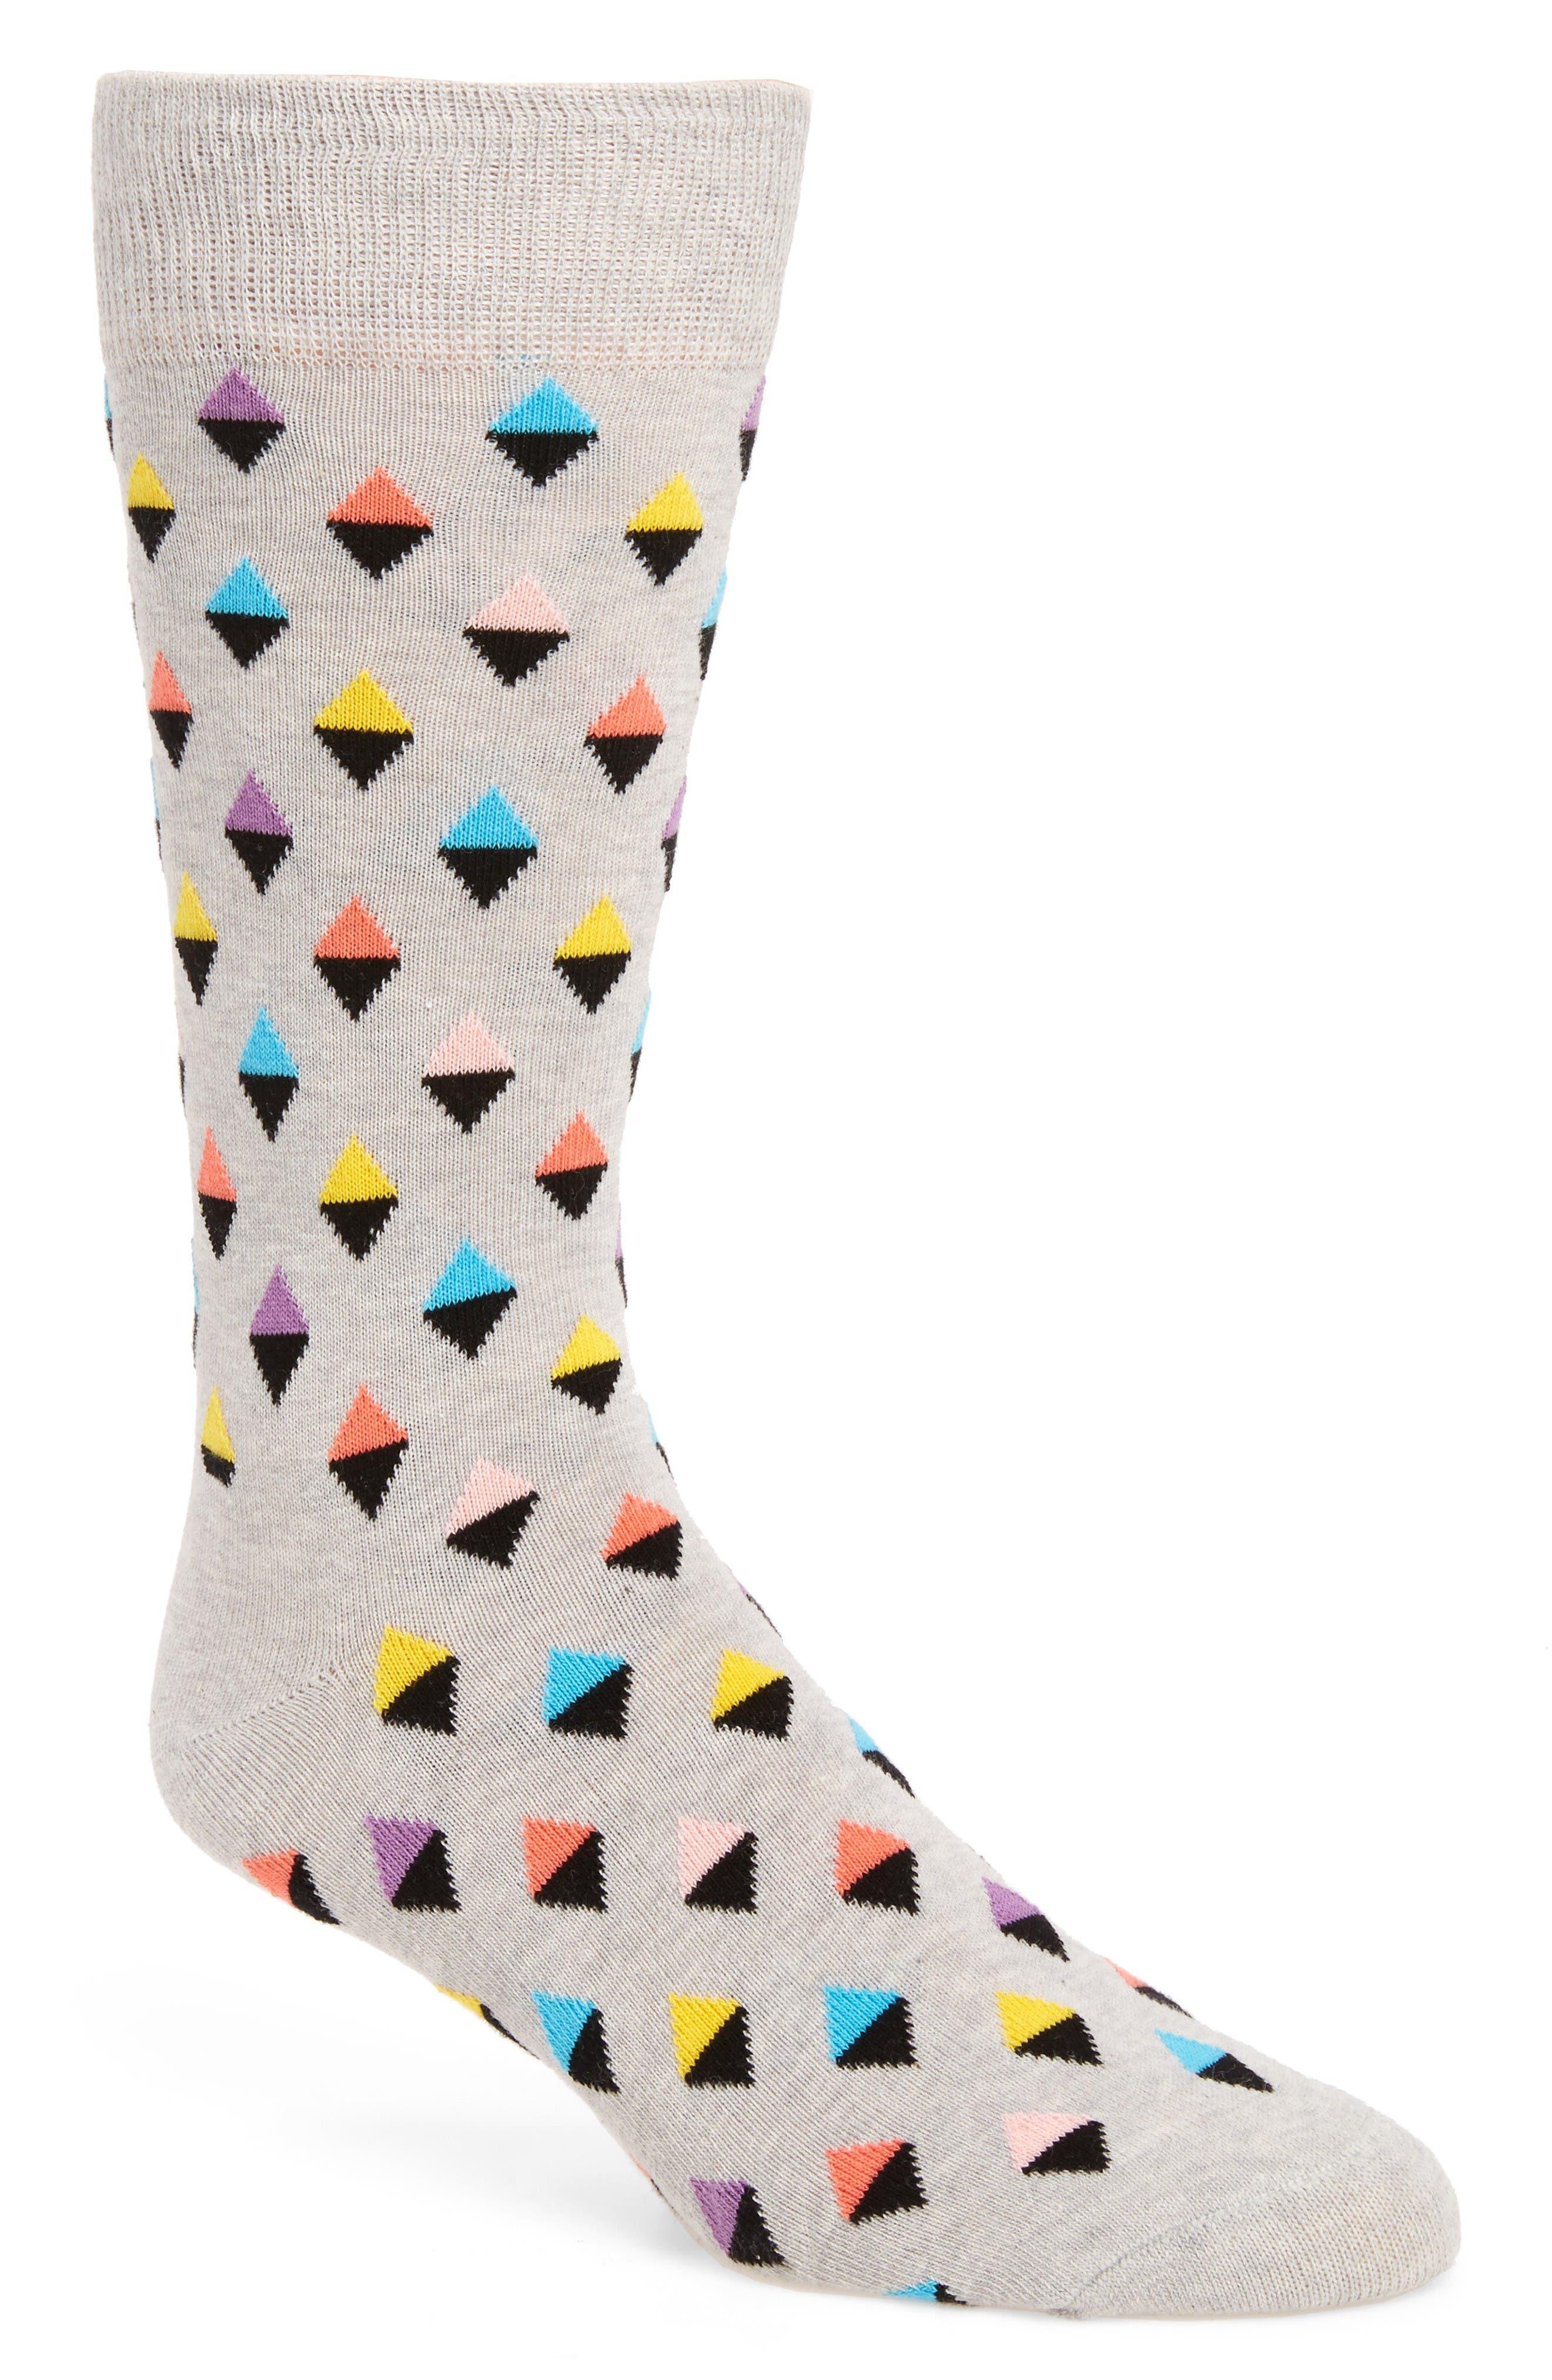 HAPPY SOCKS Mini Diamond Cotton Blend Socks